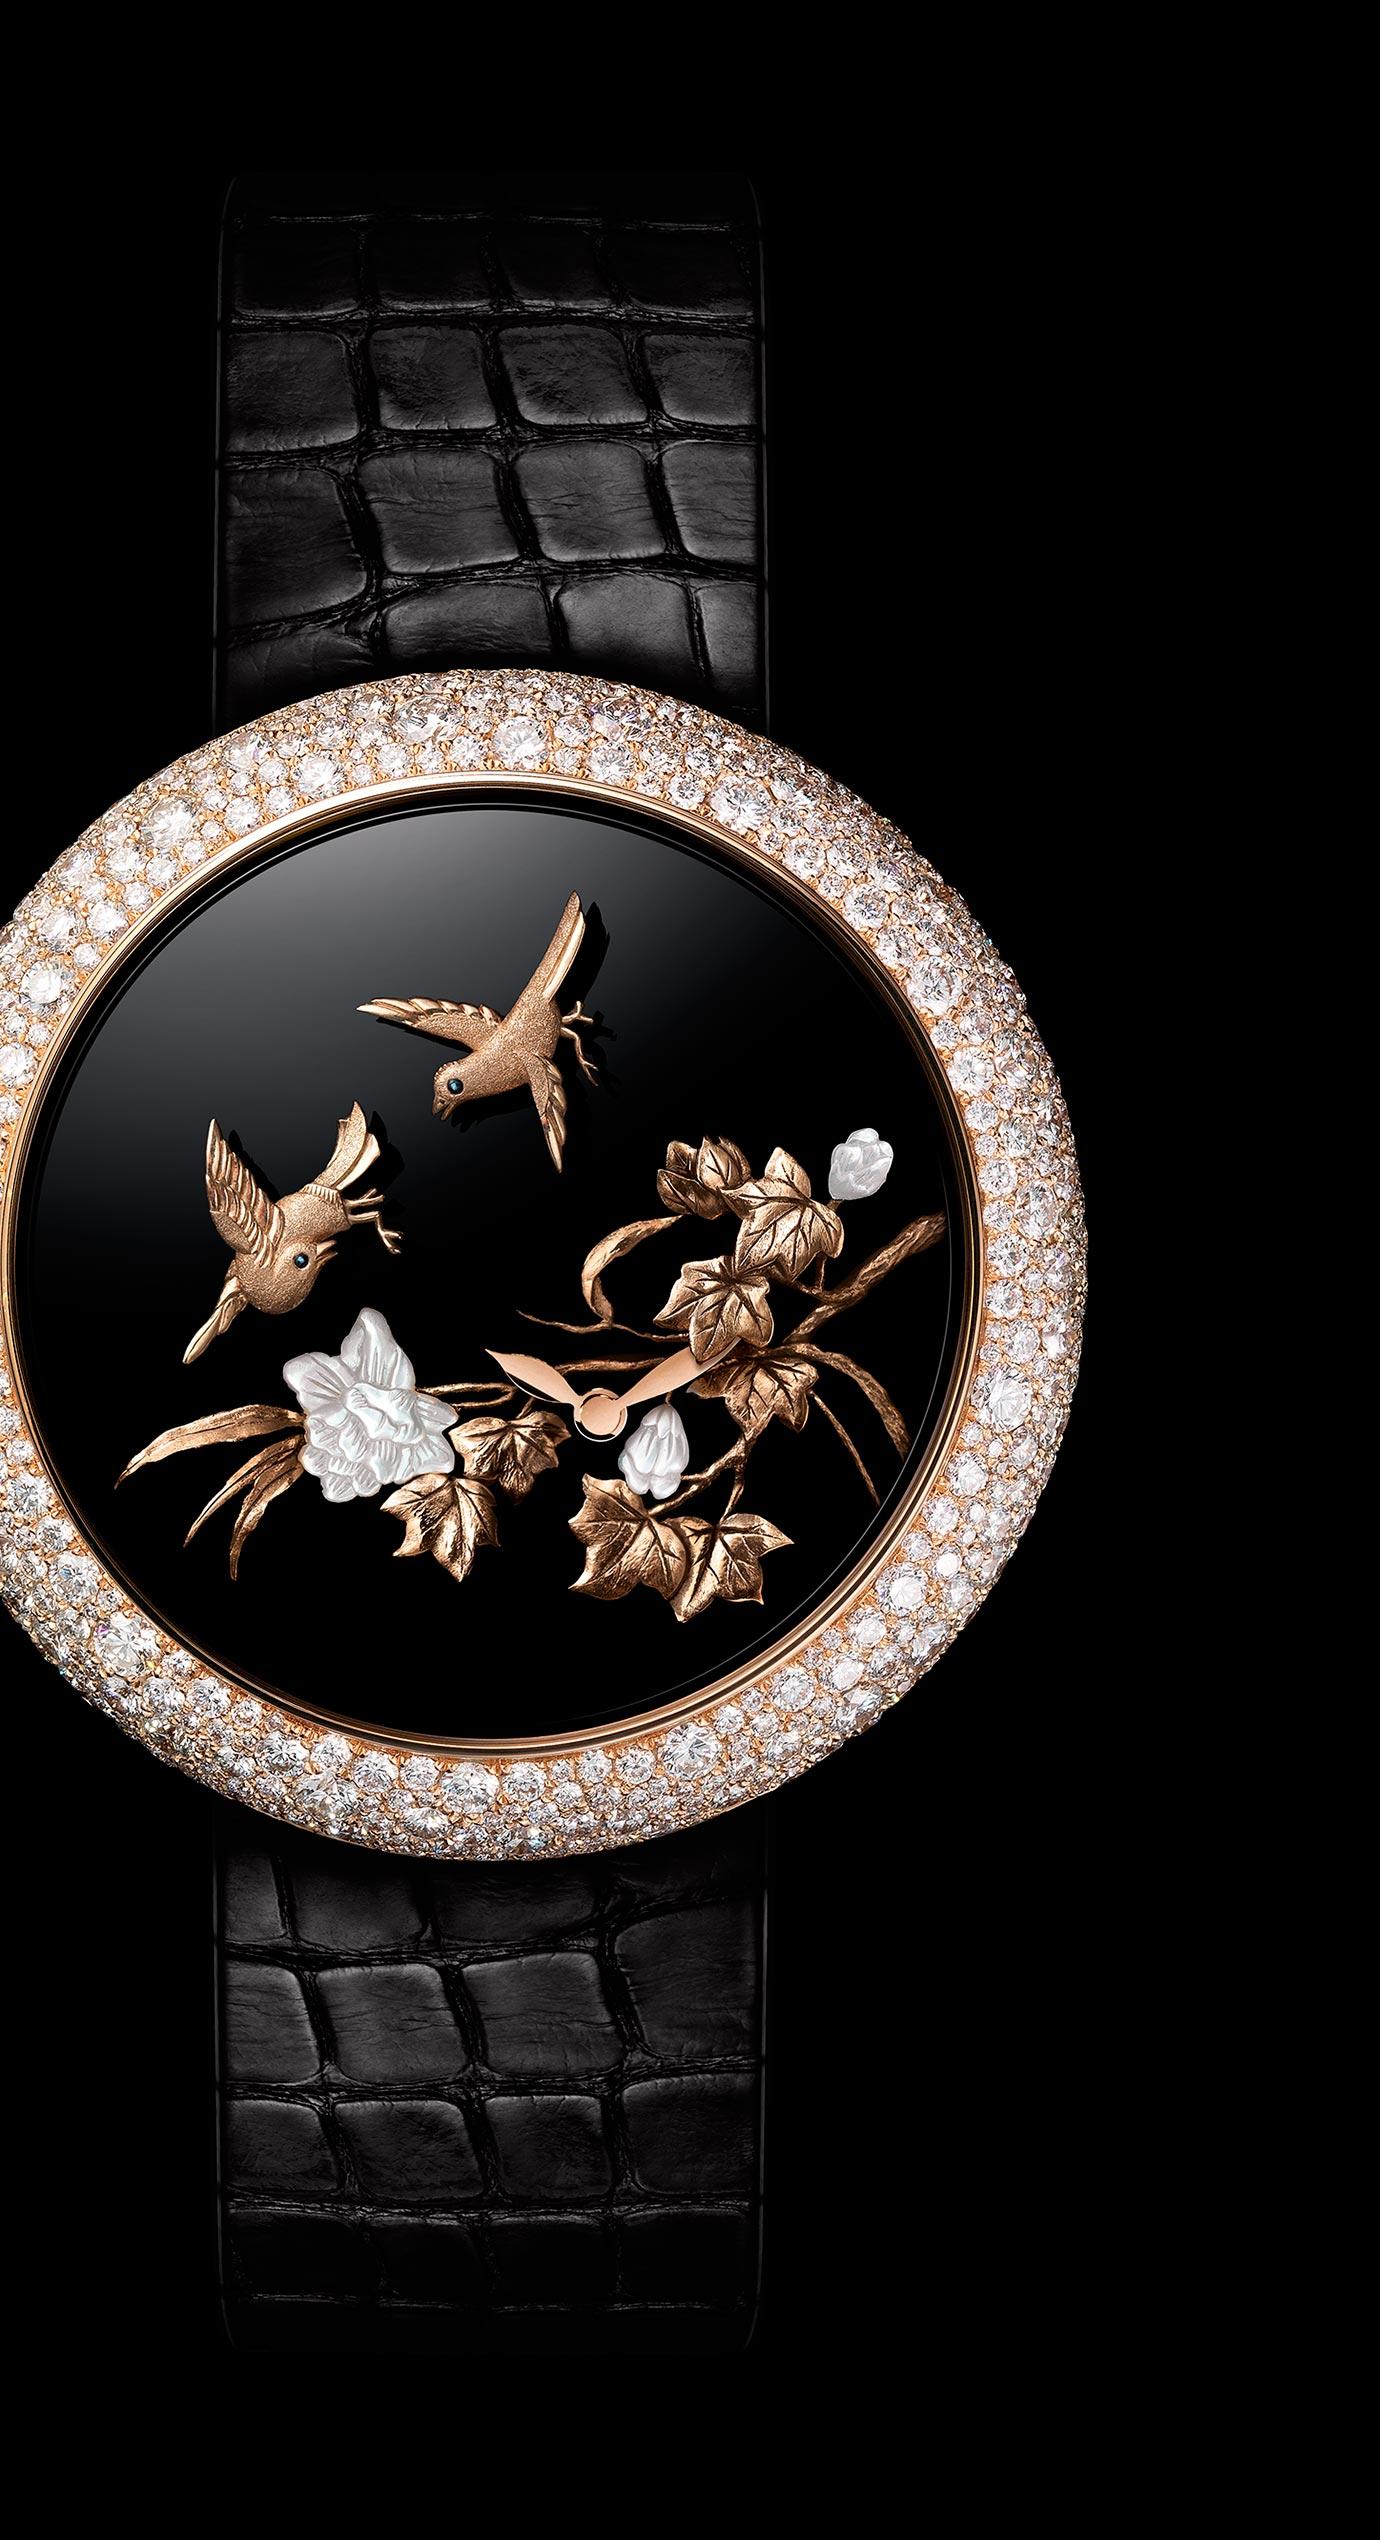 Reloj Mademoiselle Privé Coromandel Aves vibrantes realizado según la técnica del oro esculpido. - Vista ampliada